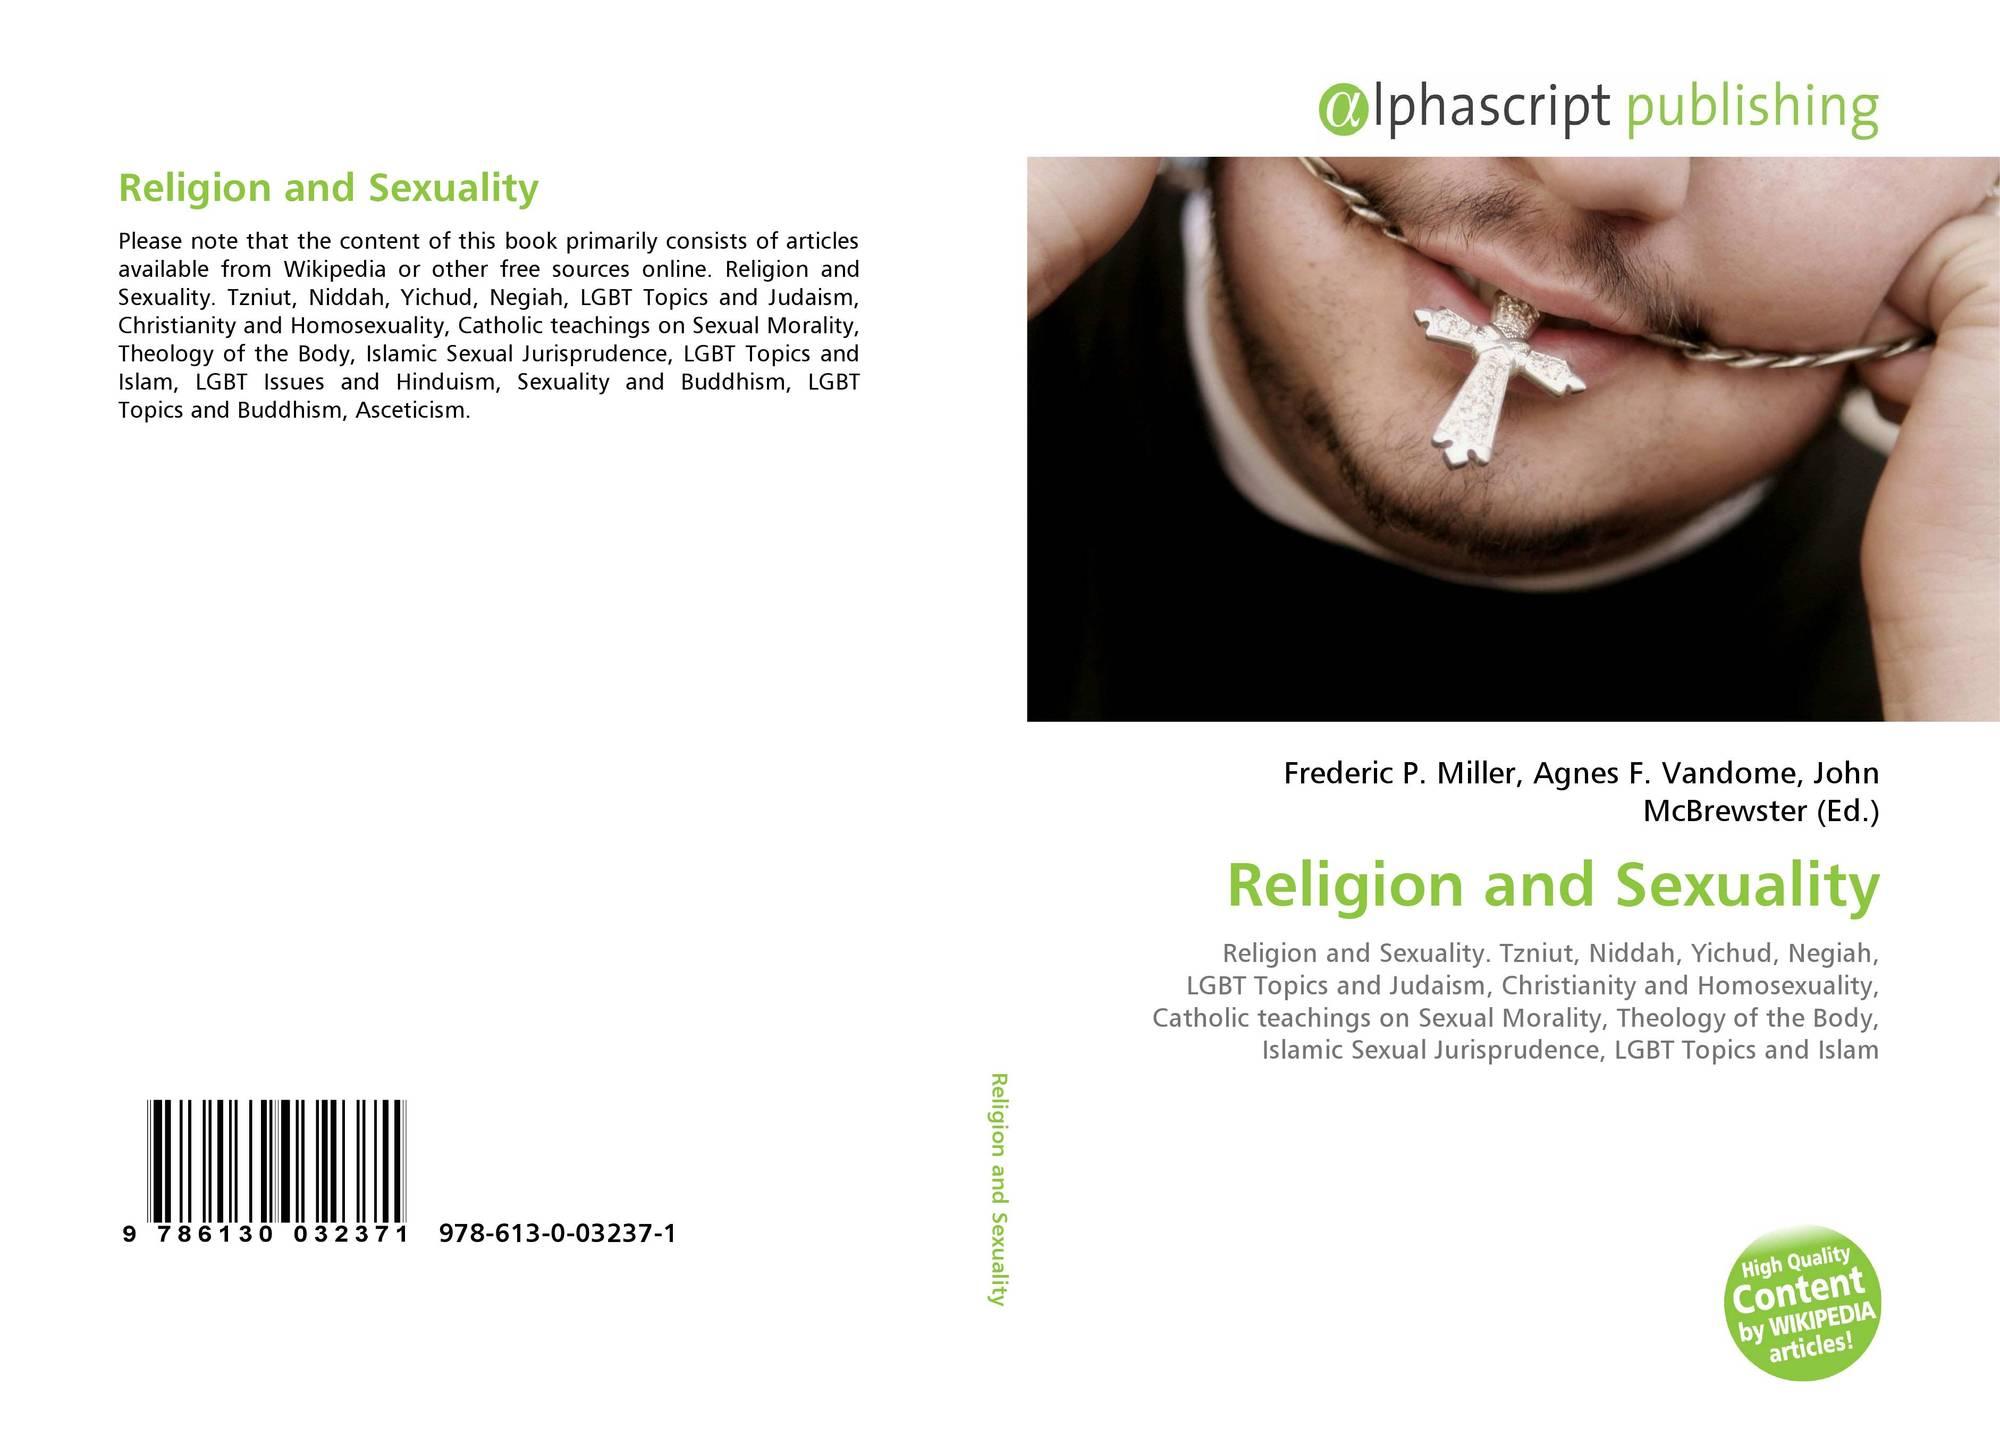 religion and sexuality topics